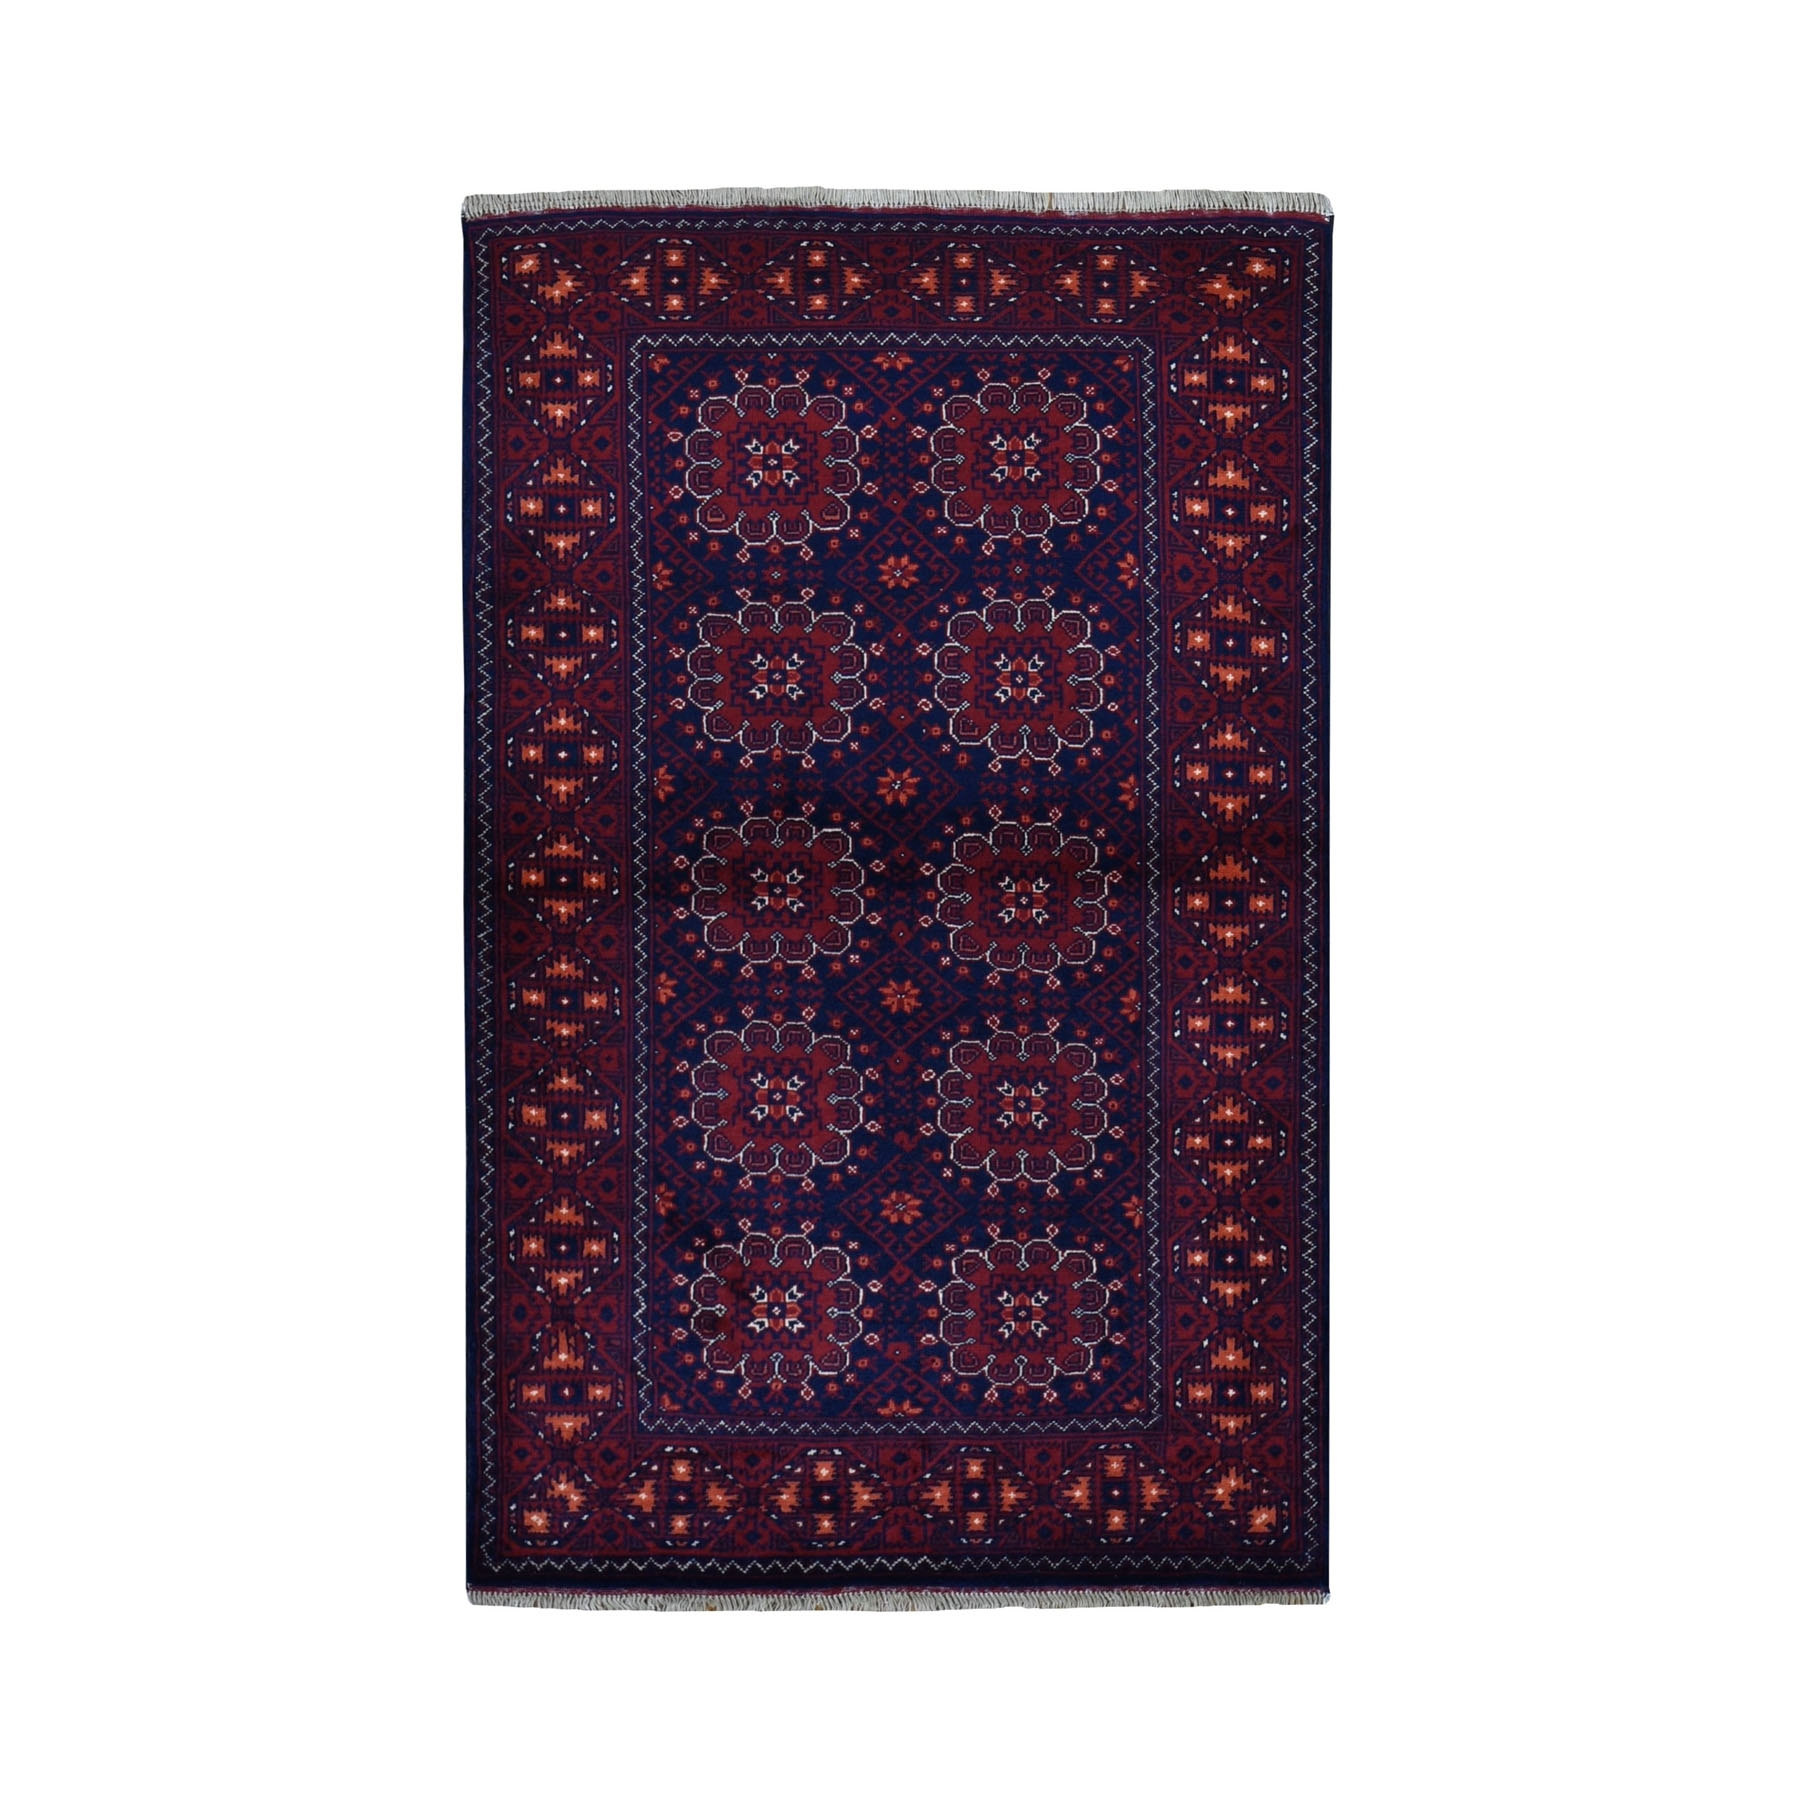 "3'2""x5'2"" Afghan Khamyab Dense Weave Silky Wool Hand Knotted Oriental Rug"